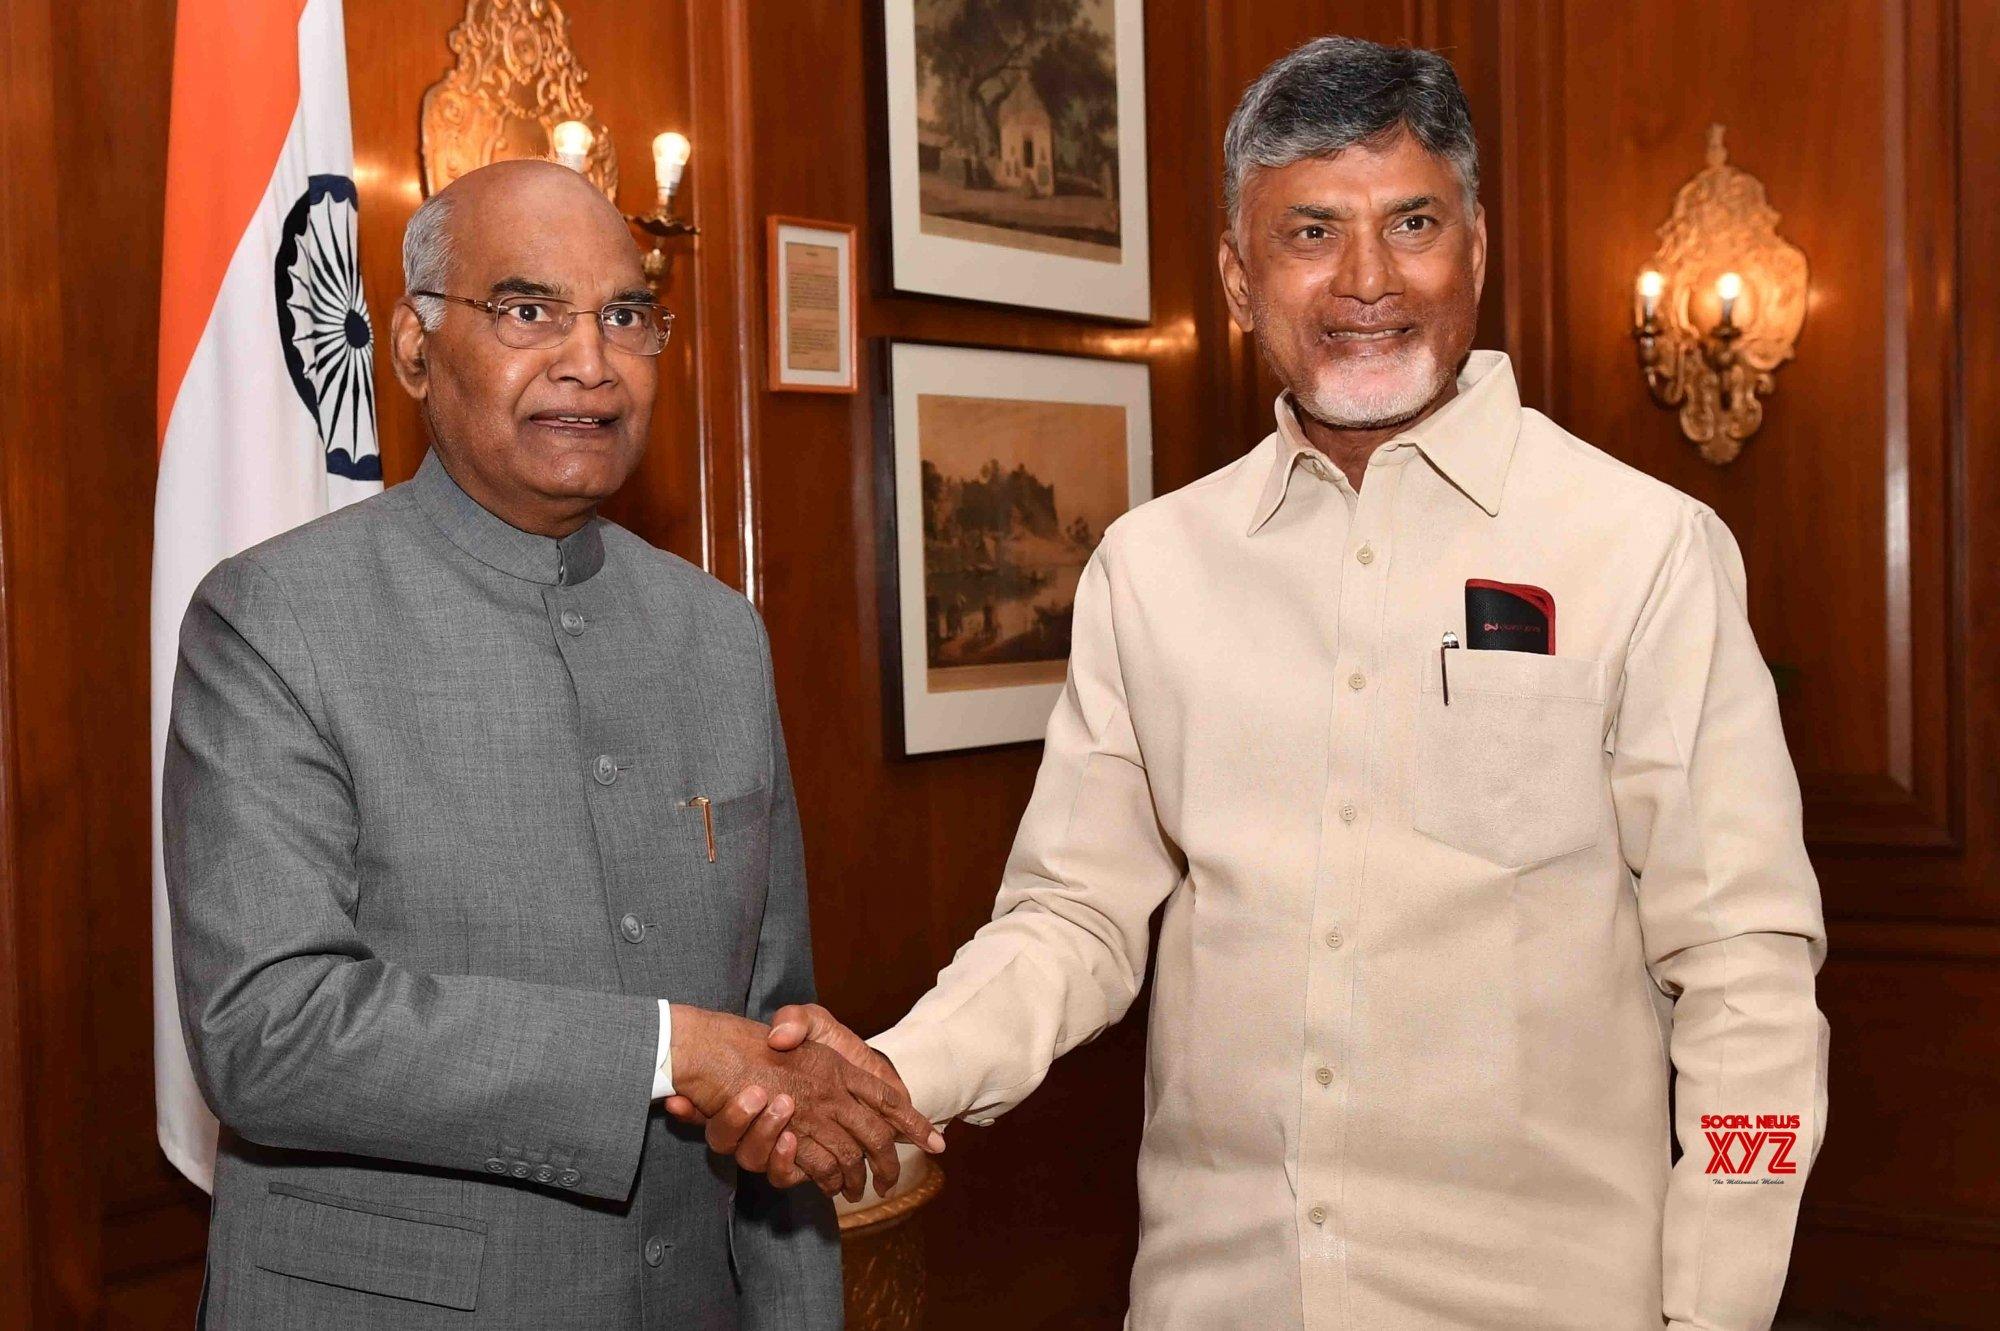 Andhra CM seeks President's intervention for 'justice'